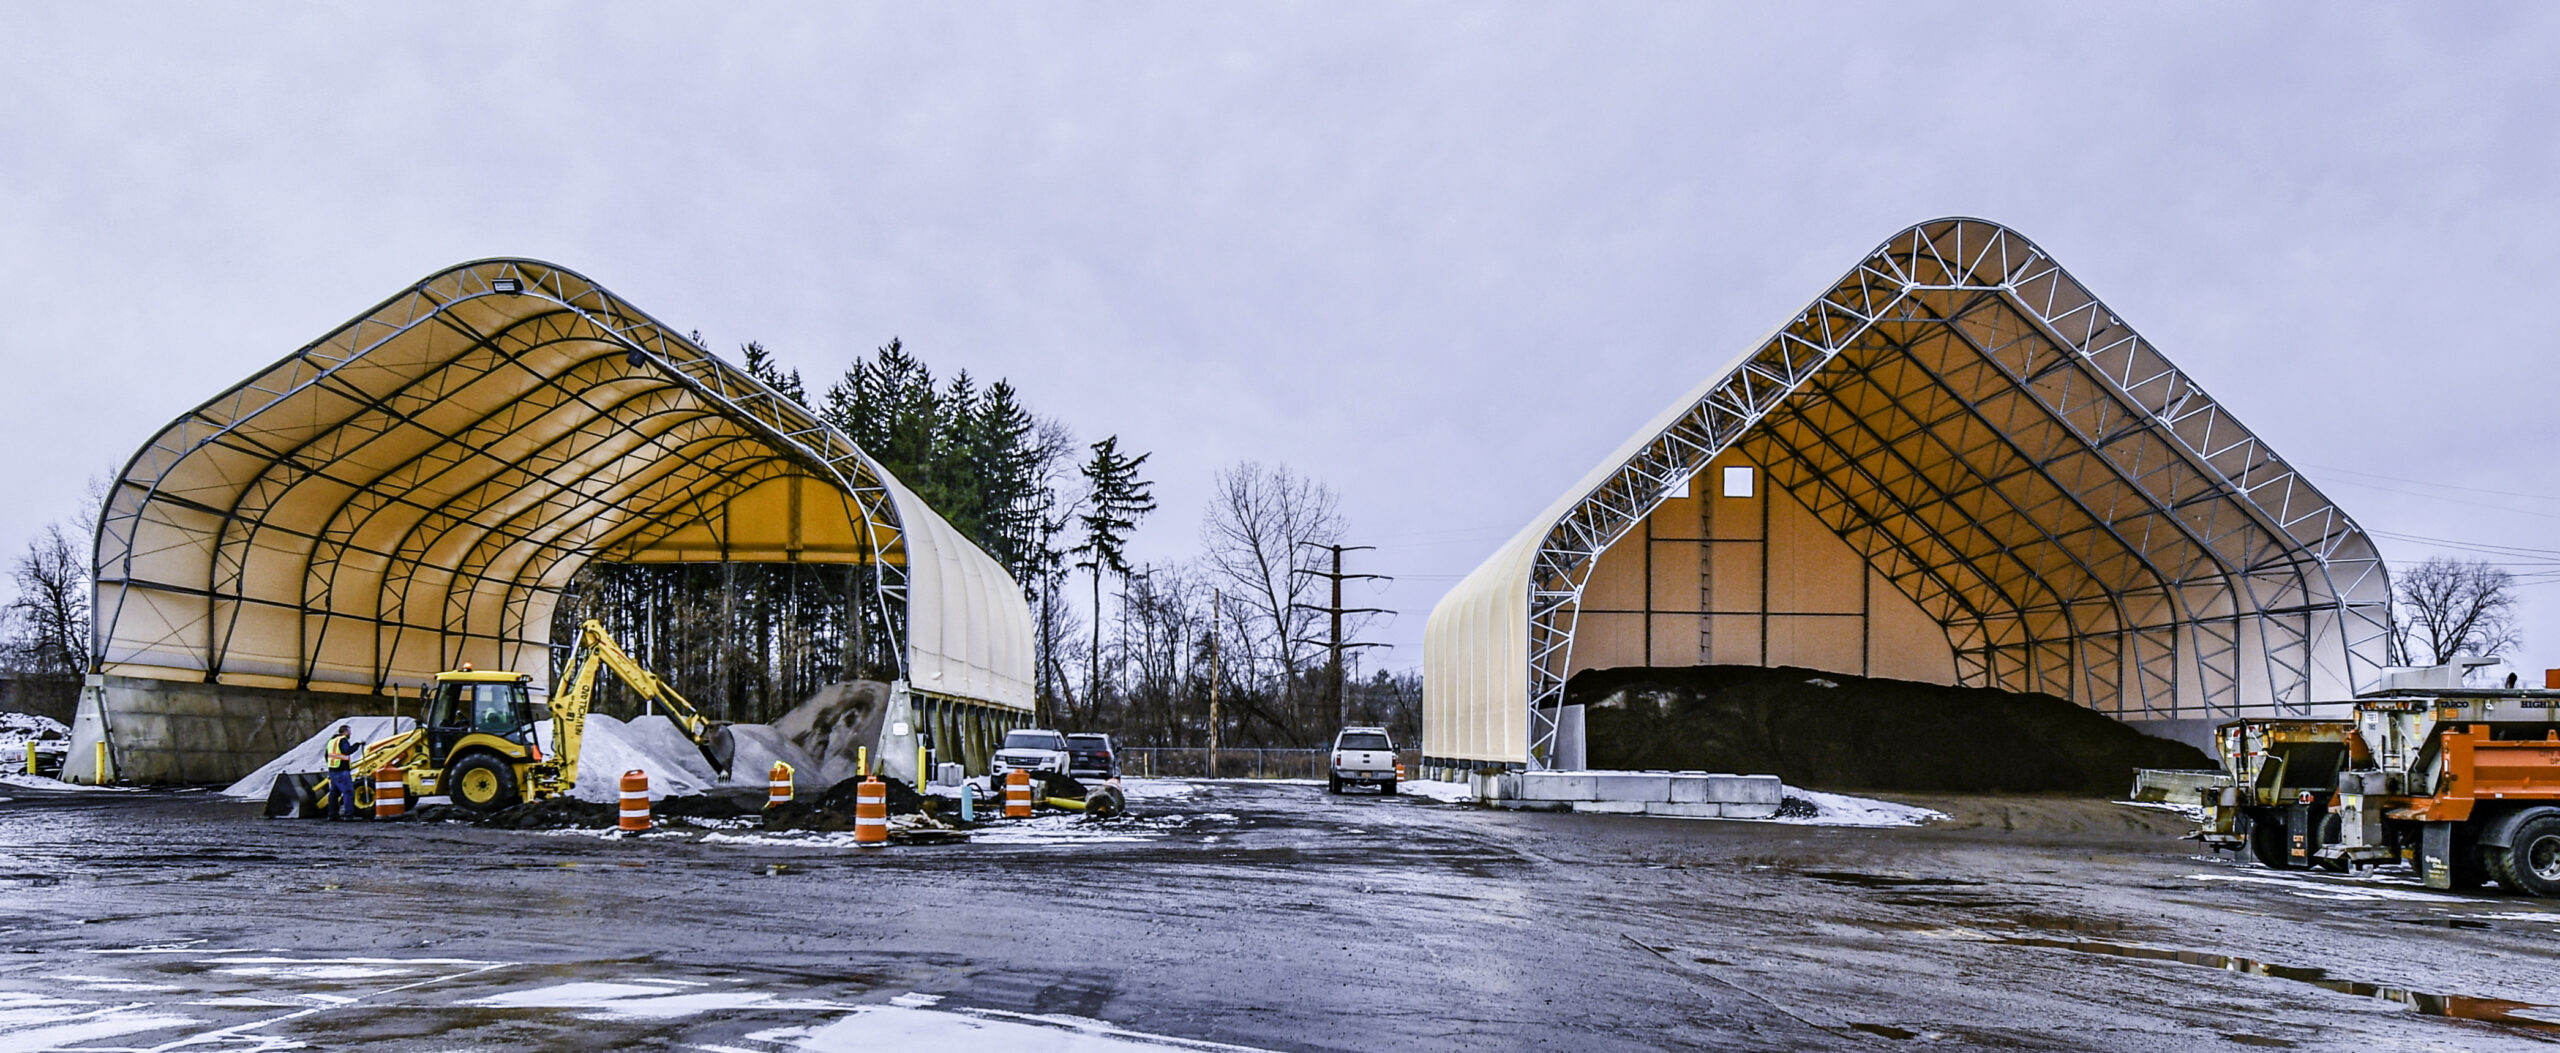 Salt Storage Buildings Massachusetts